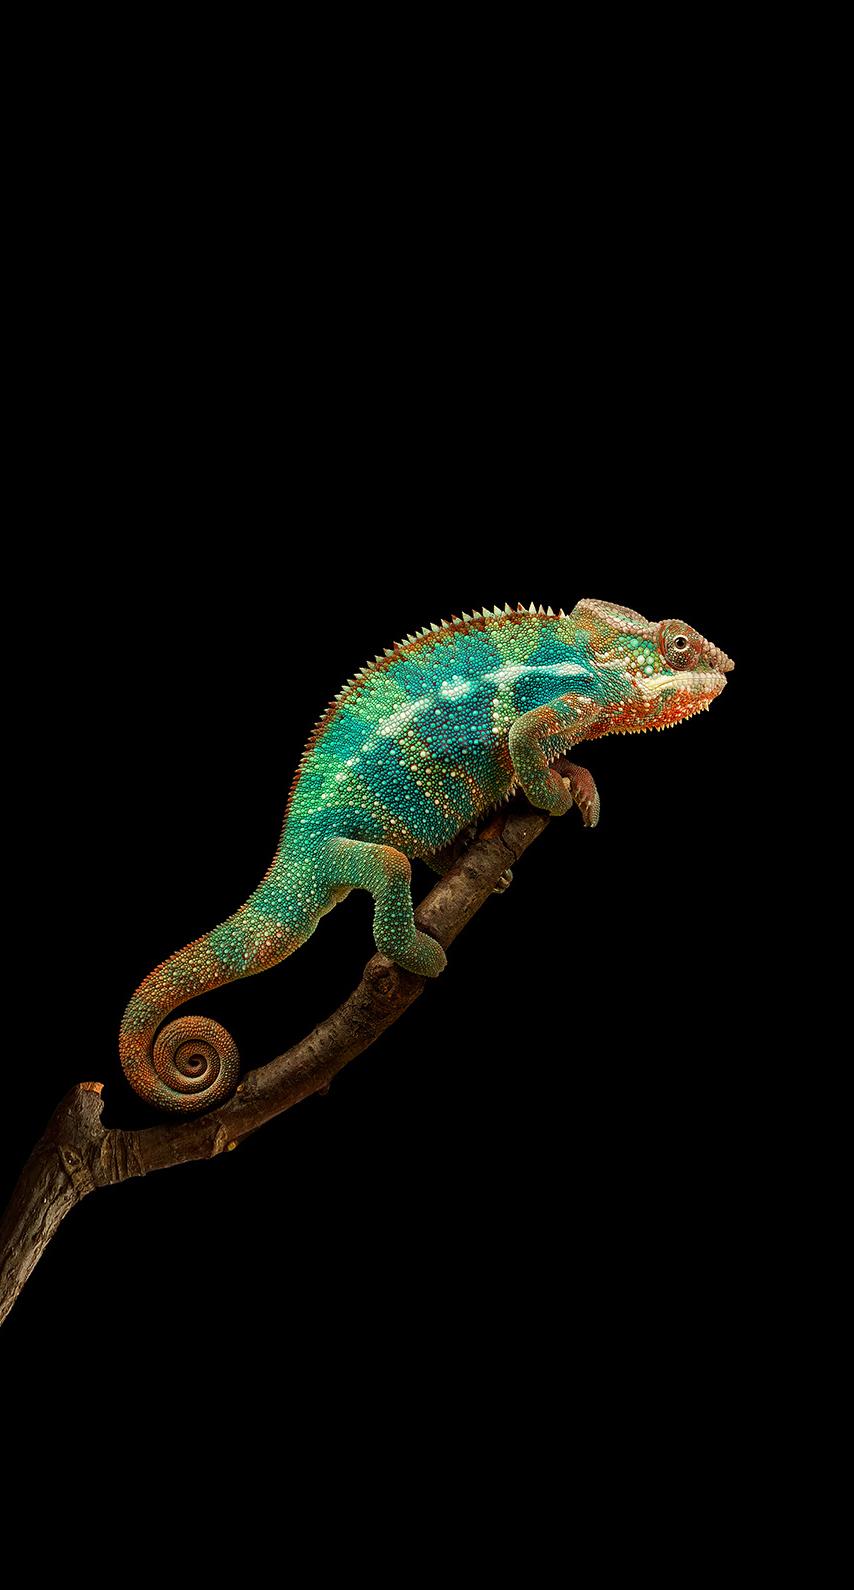 organism, scaled reptile